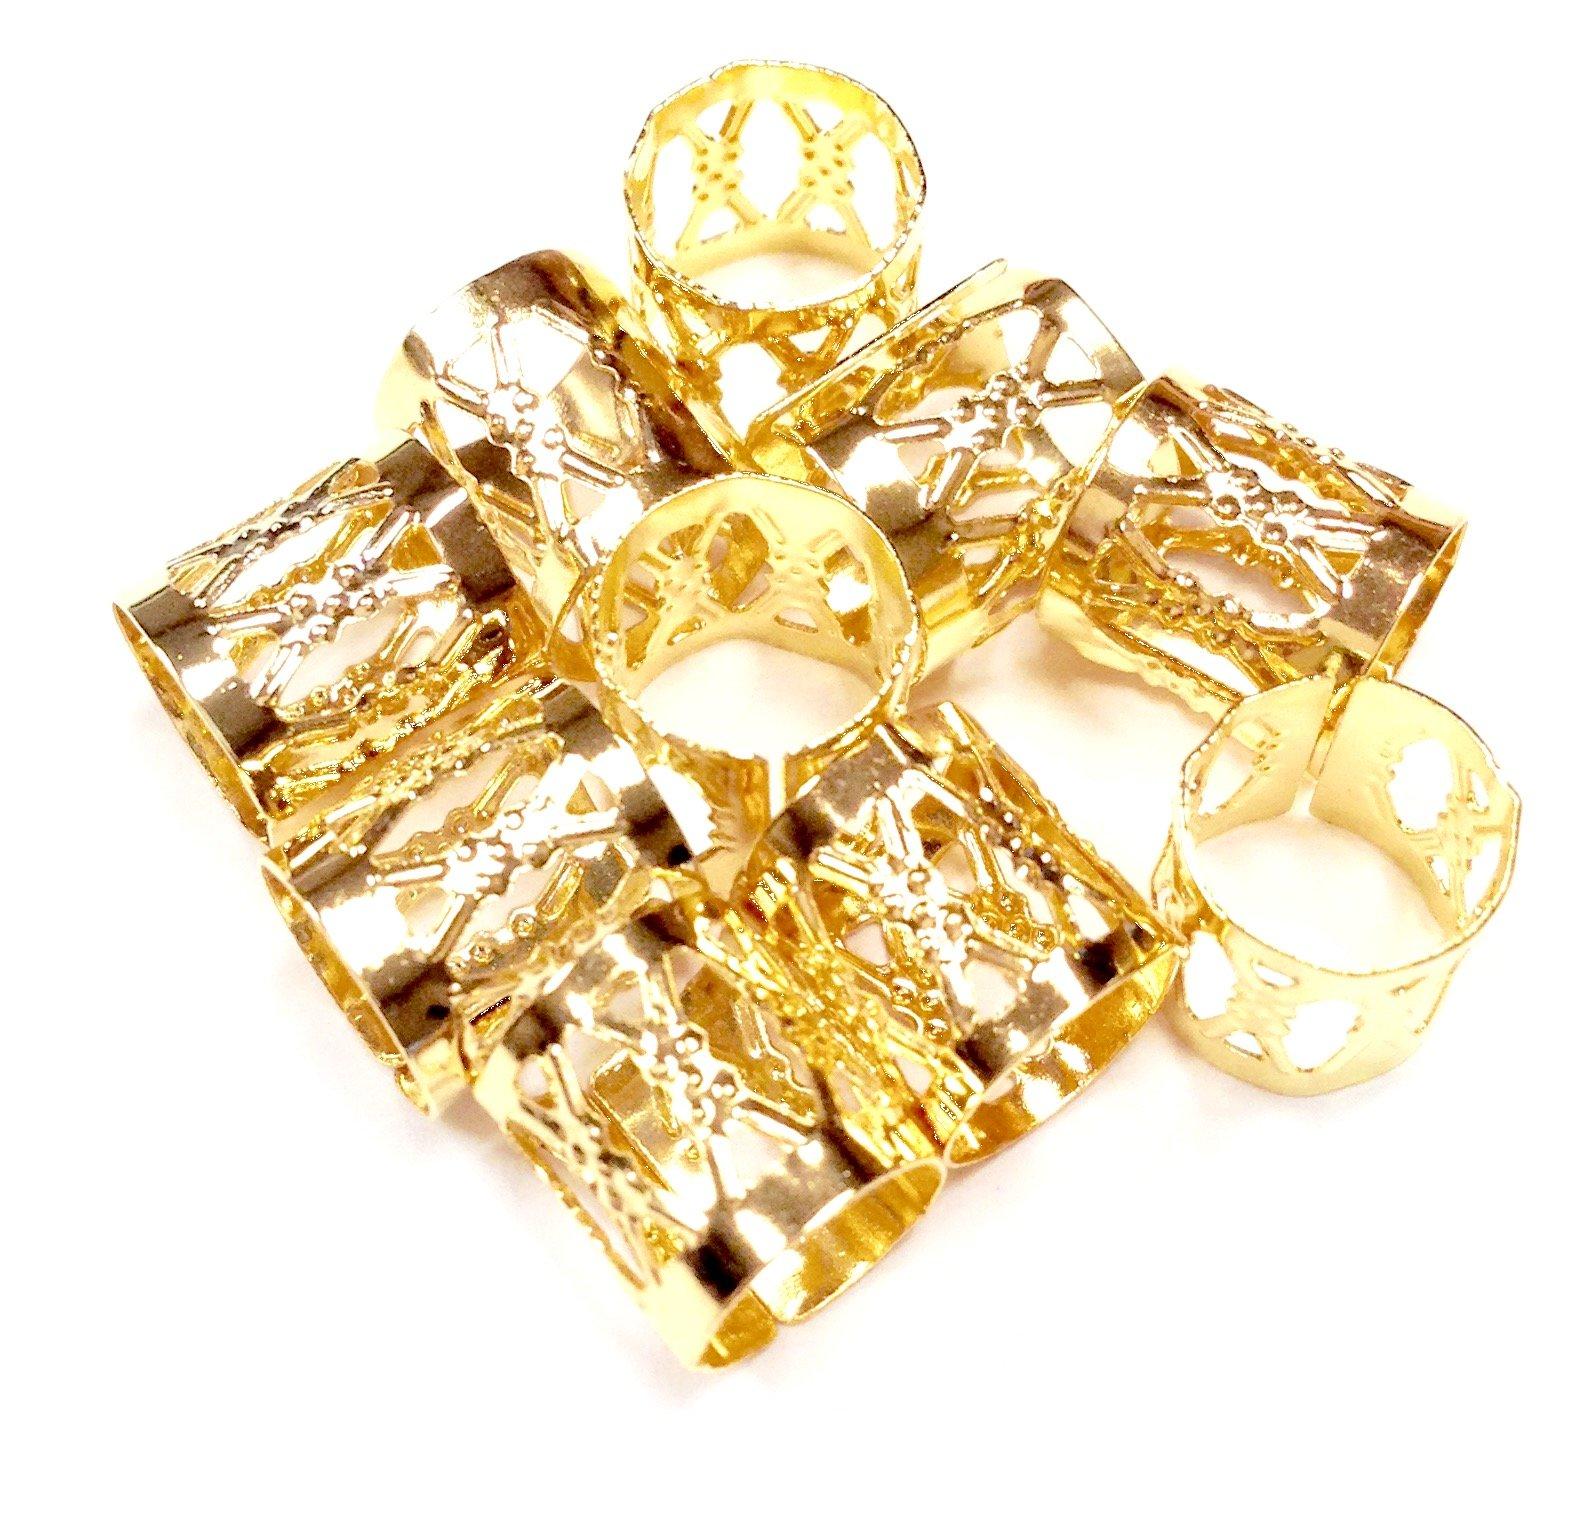 Dread Lock Dreadlocks Braiding Beads Gold Silver Metal Accesories Cuffs Hair Decoration Filigree Tube Rasta 10mm